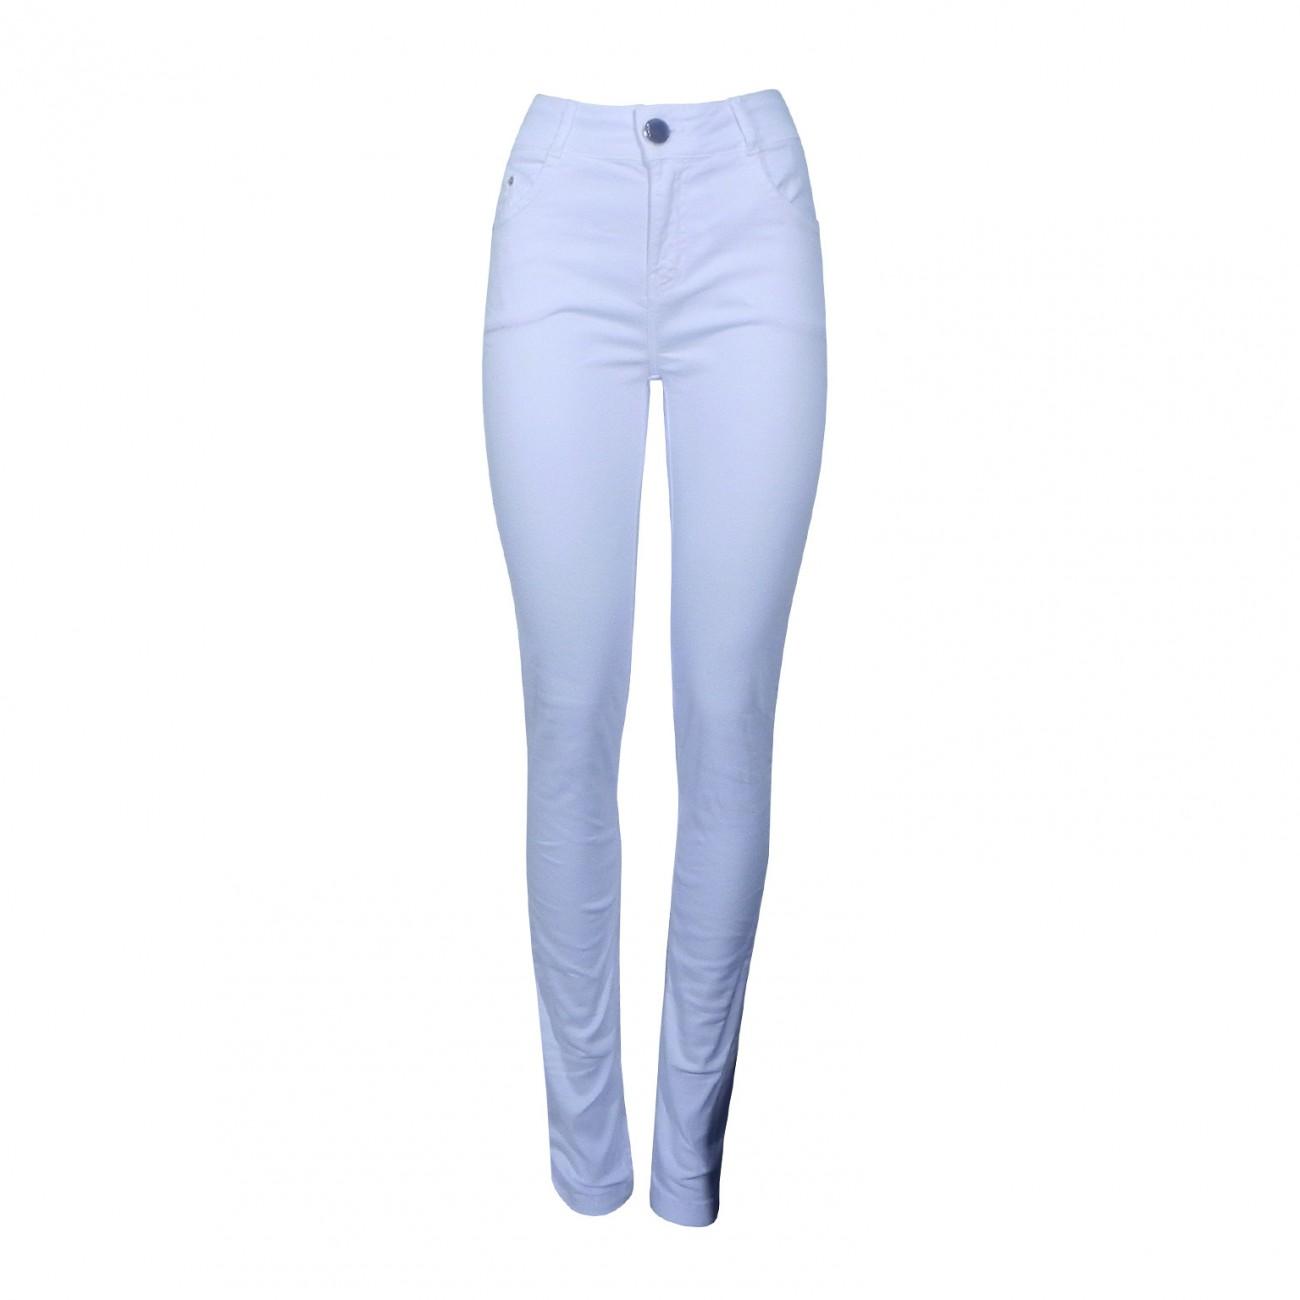 ab6379c79 Calça Jeans Color Feminina Skinny Dimy - Cor Branca